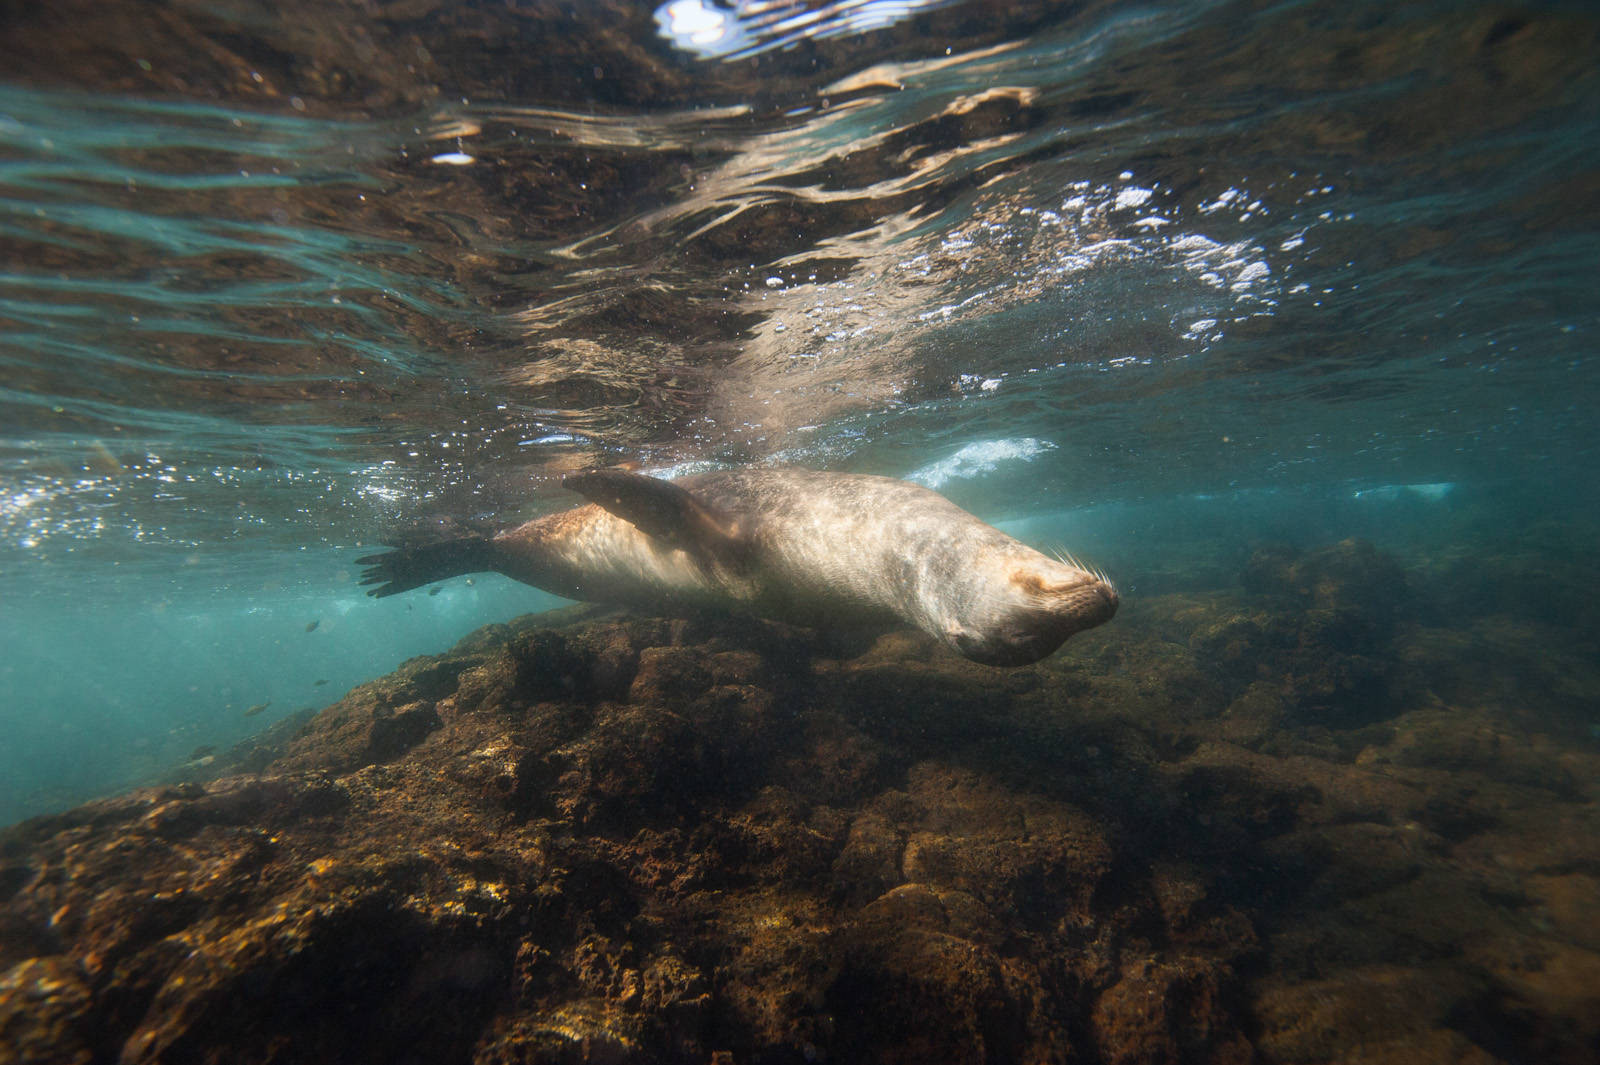 Photo: A Galapagos sea lion(Zalophus wollebaeki) sleeps beneath the surface, near Bartholomew Island, Galapagos National Park.